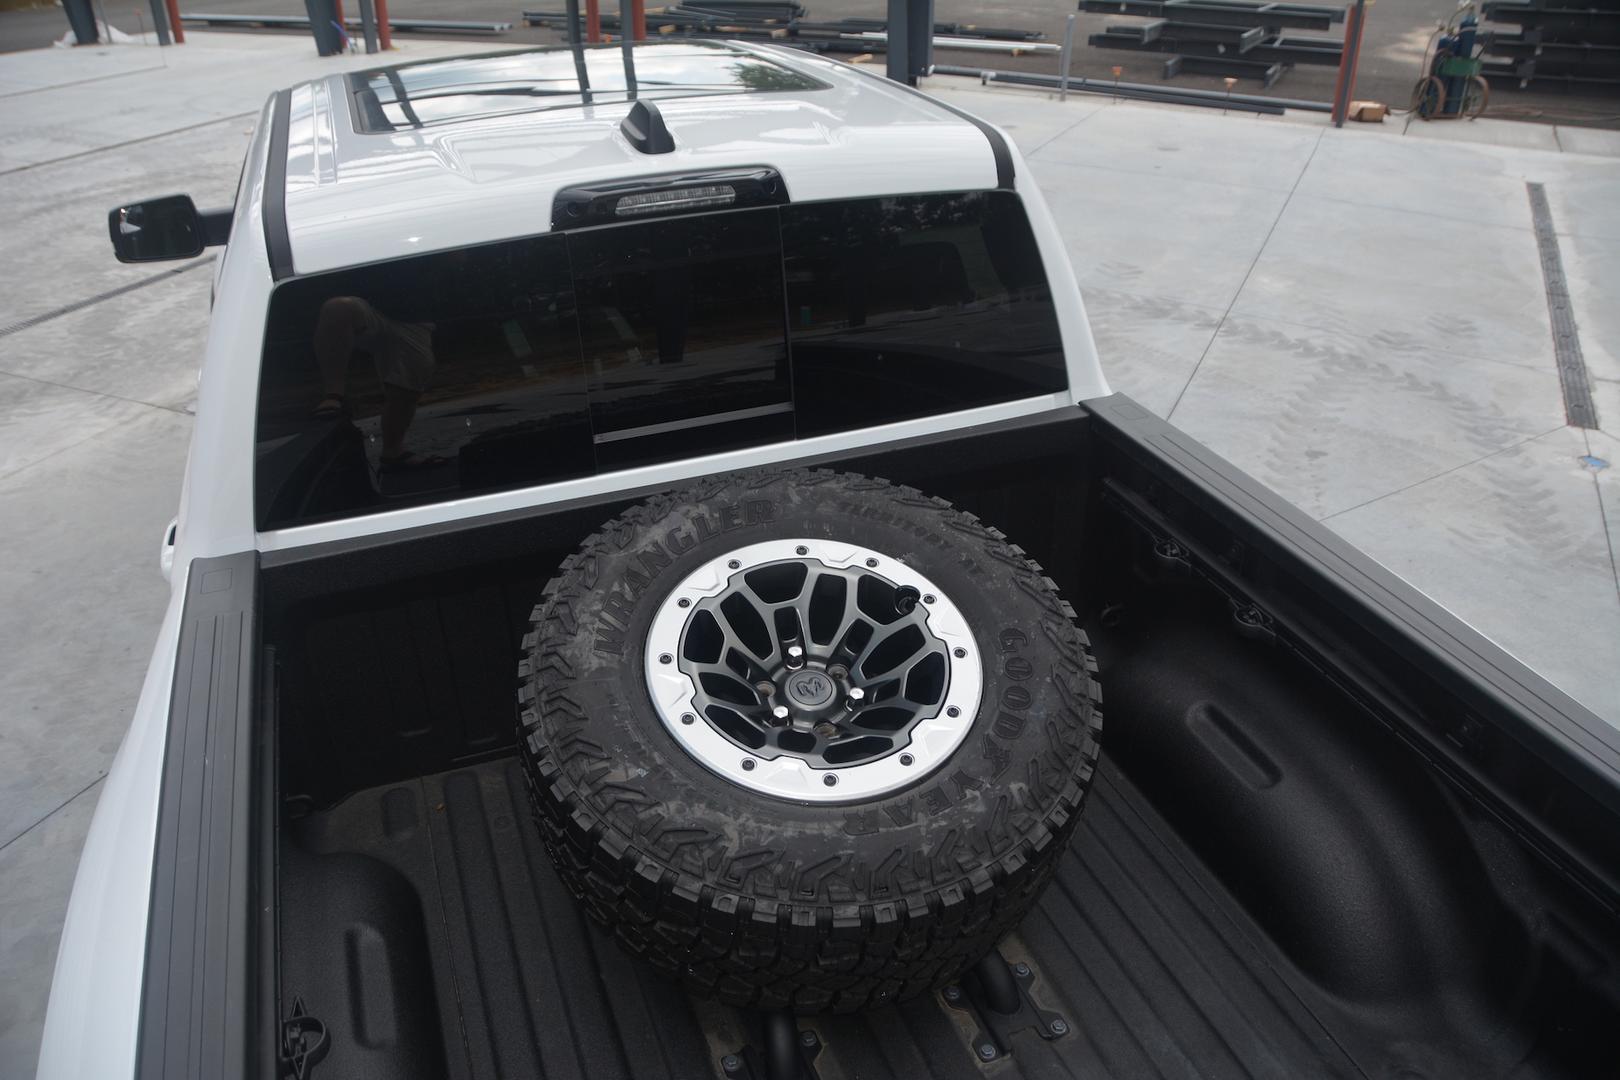 2021 Ram 1500 TRX trunk